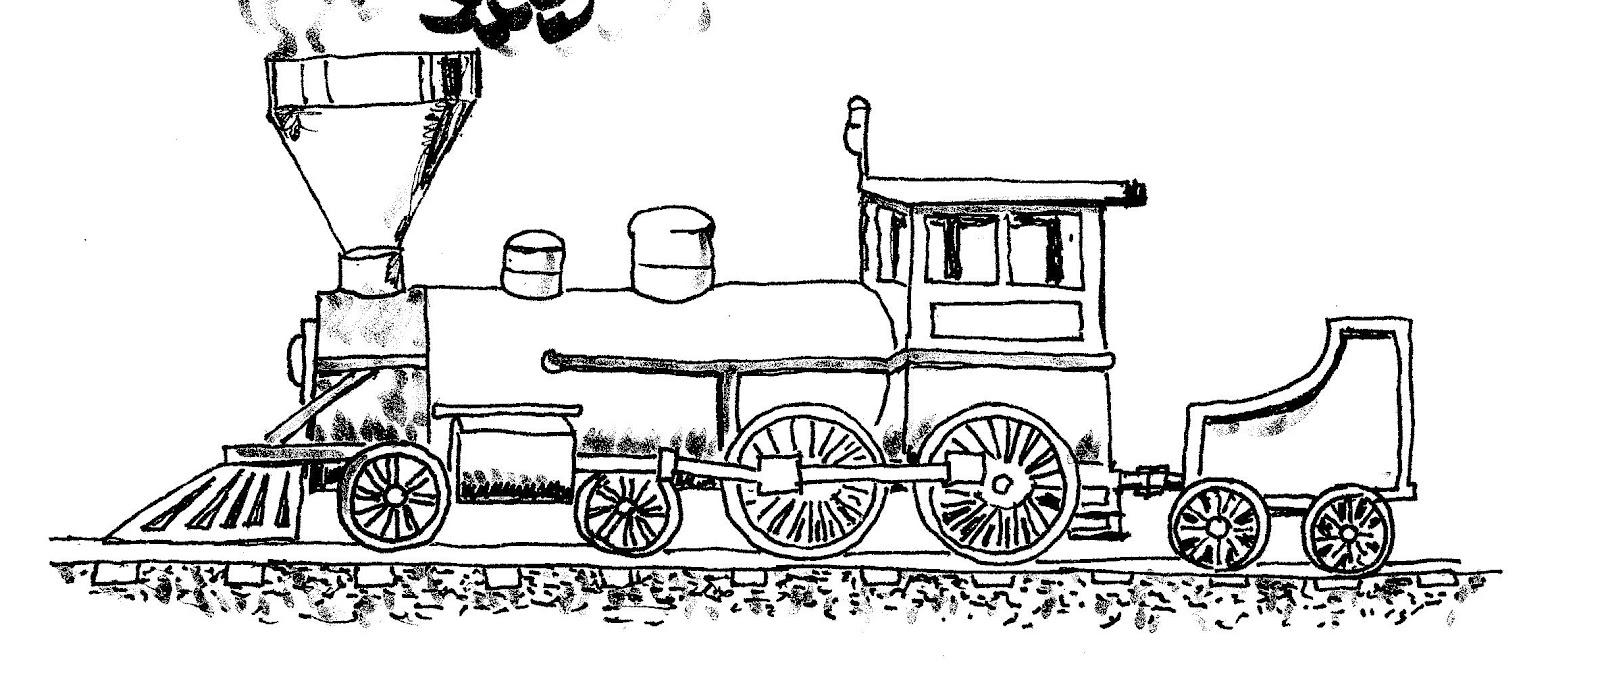 Fabtech 7 4 Link System W Coil Springs Front Dual Dirt Logic 225 Resi Shocks Rear Dirt Logic Shocks Shocks 2013 16 Ram 3500 4wd together with Jupiter Fantasy Lo otive Concept 451415927 moreover Coloring Pages Of Tractors furthermore Index besides Engine Engine Oil Cooler. on train engine cab